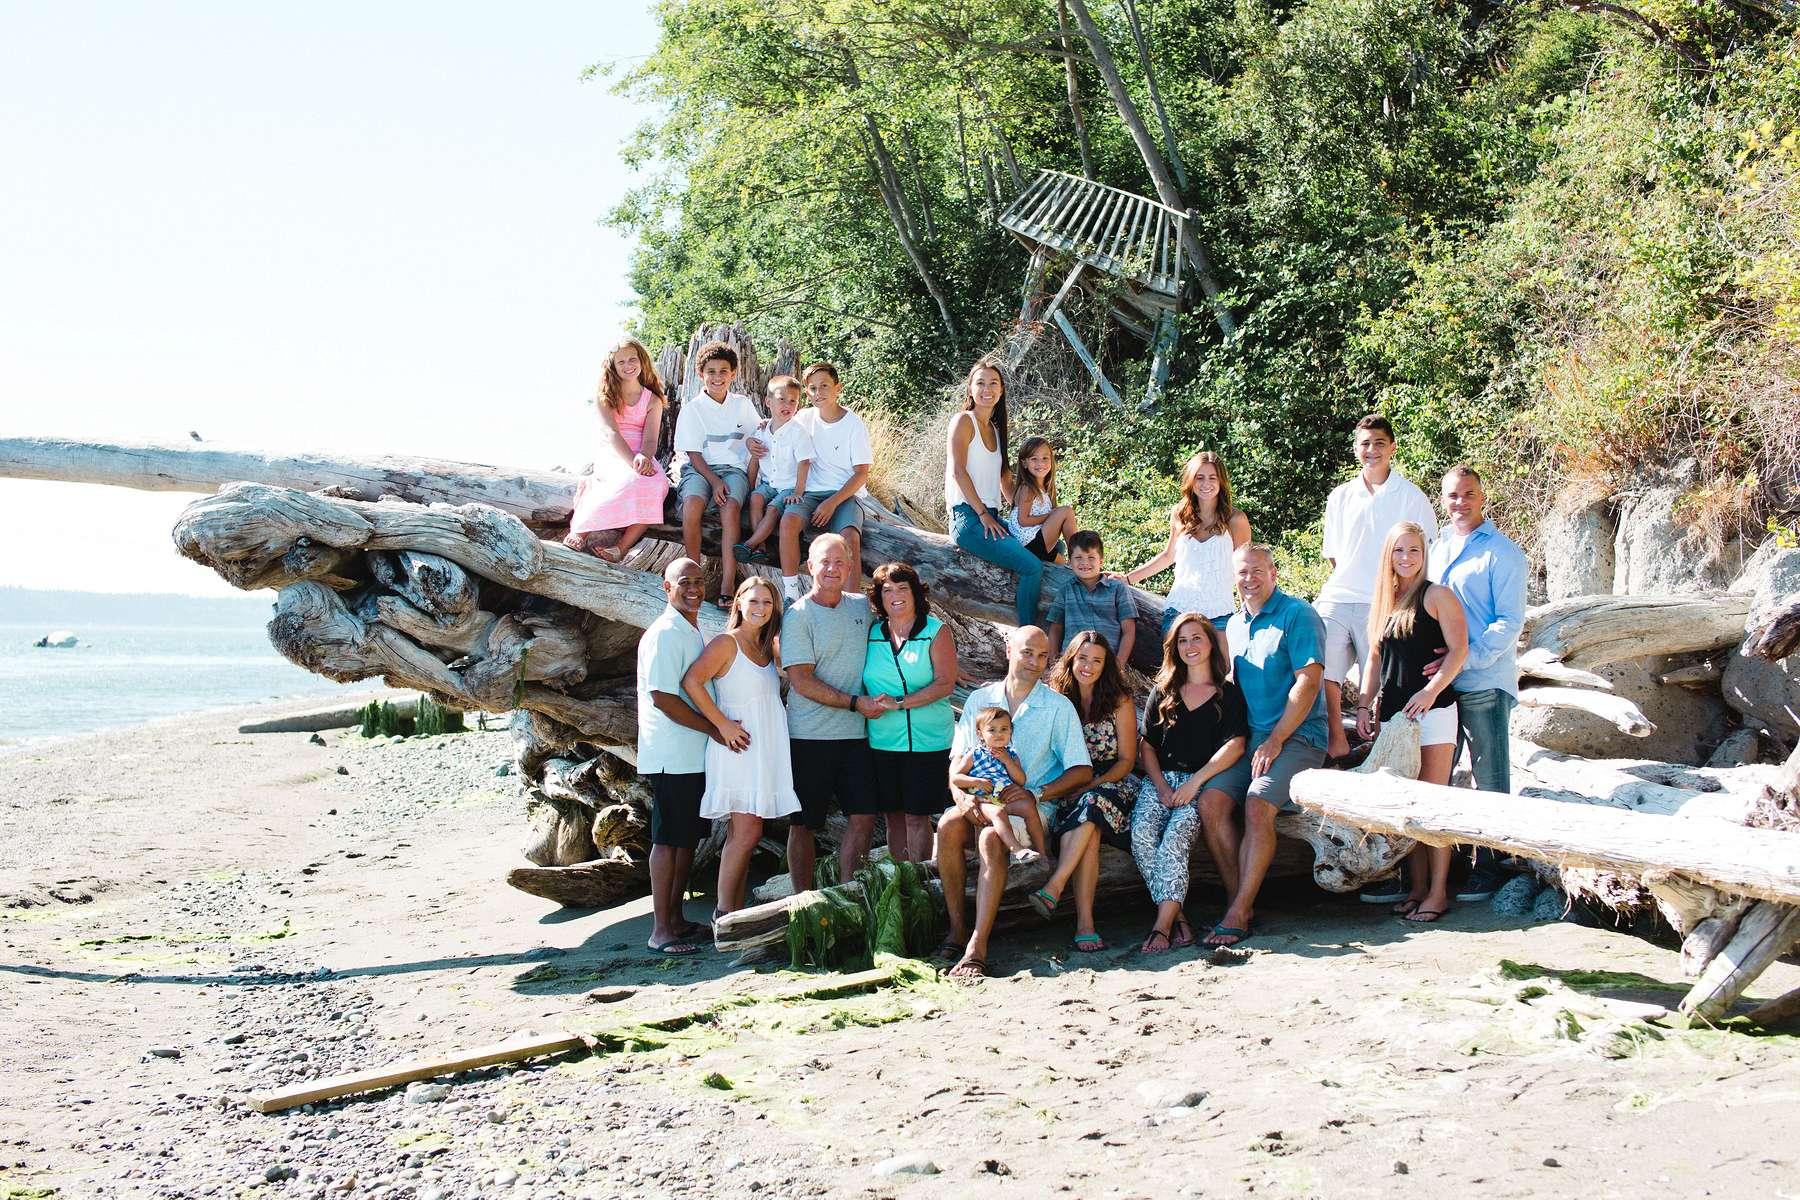 Family reunion portraits on the beach!